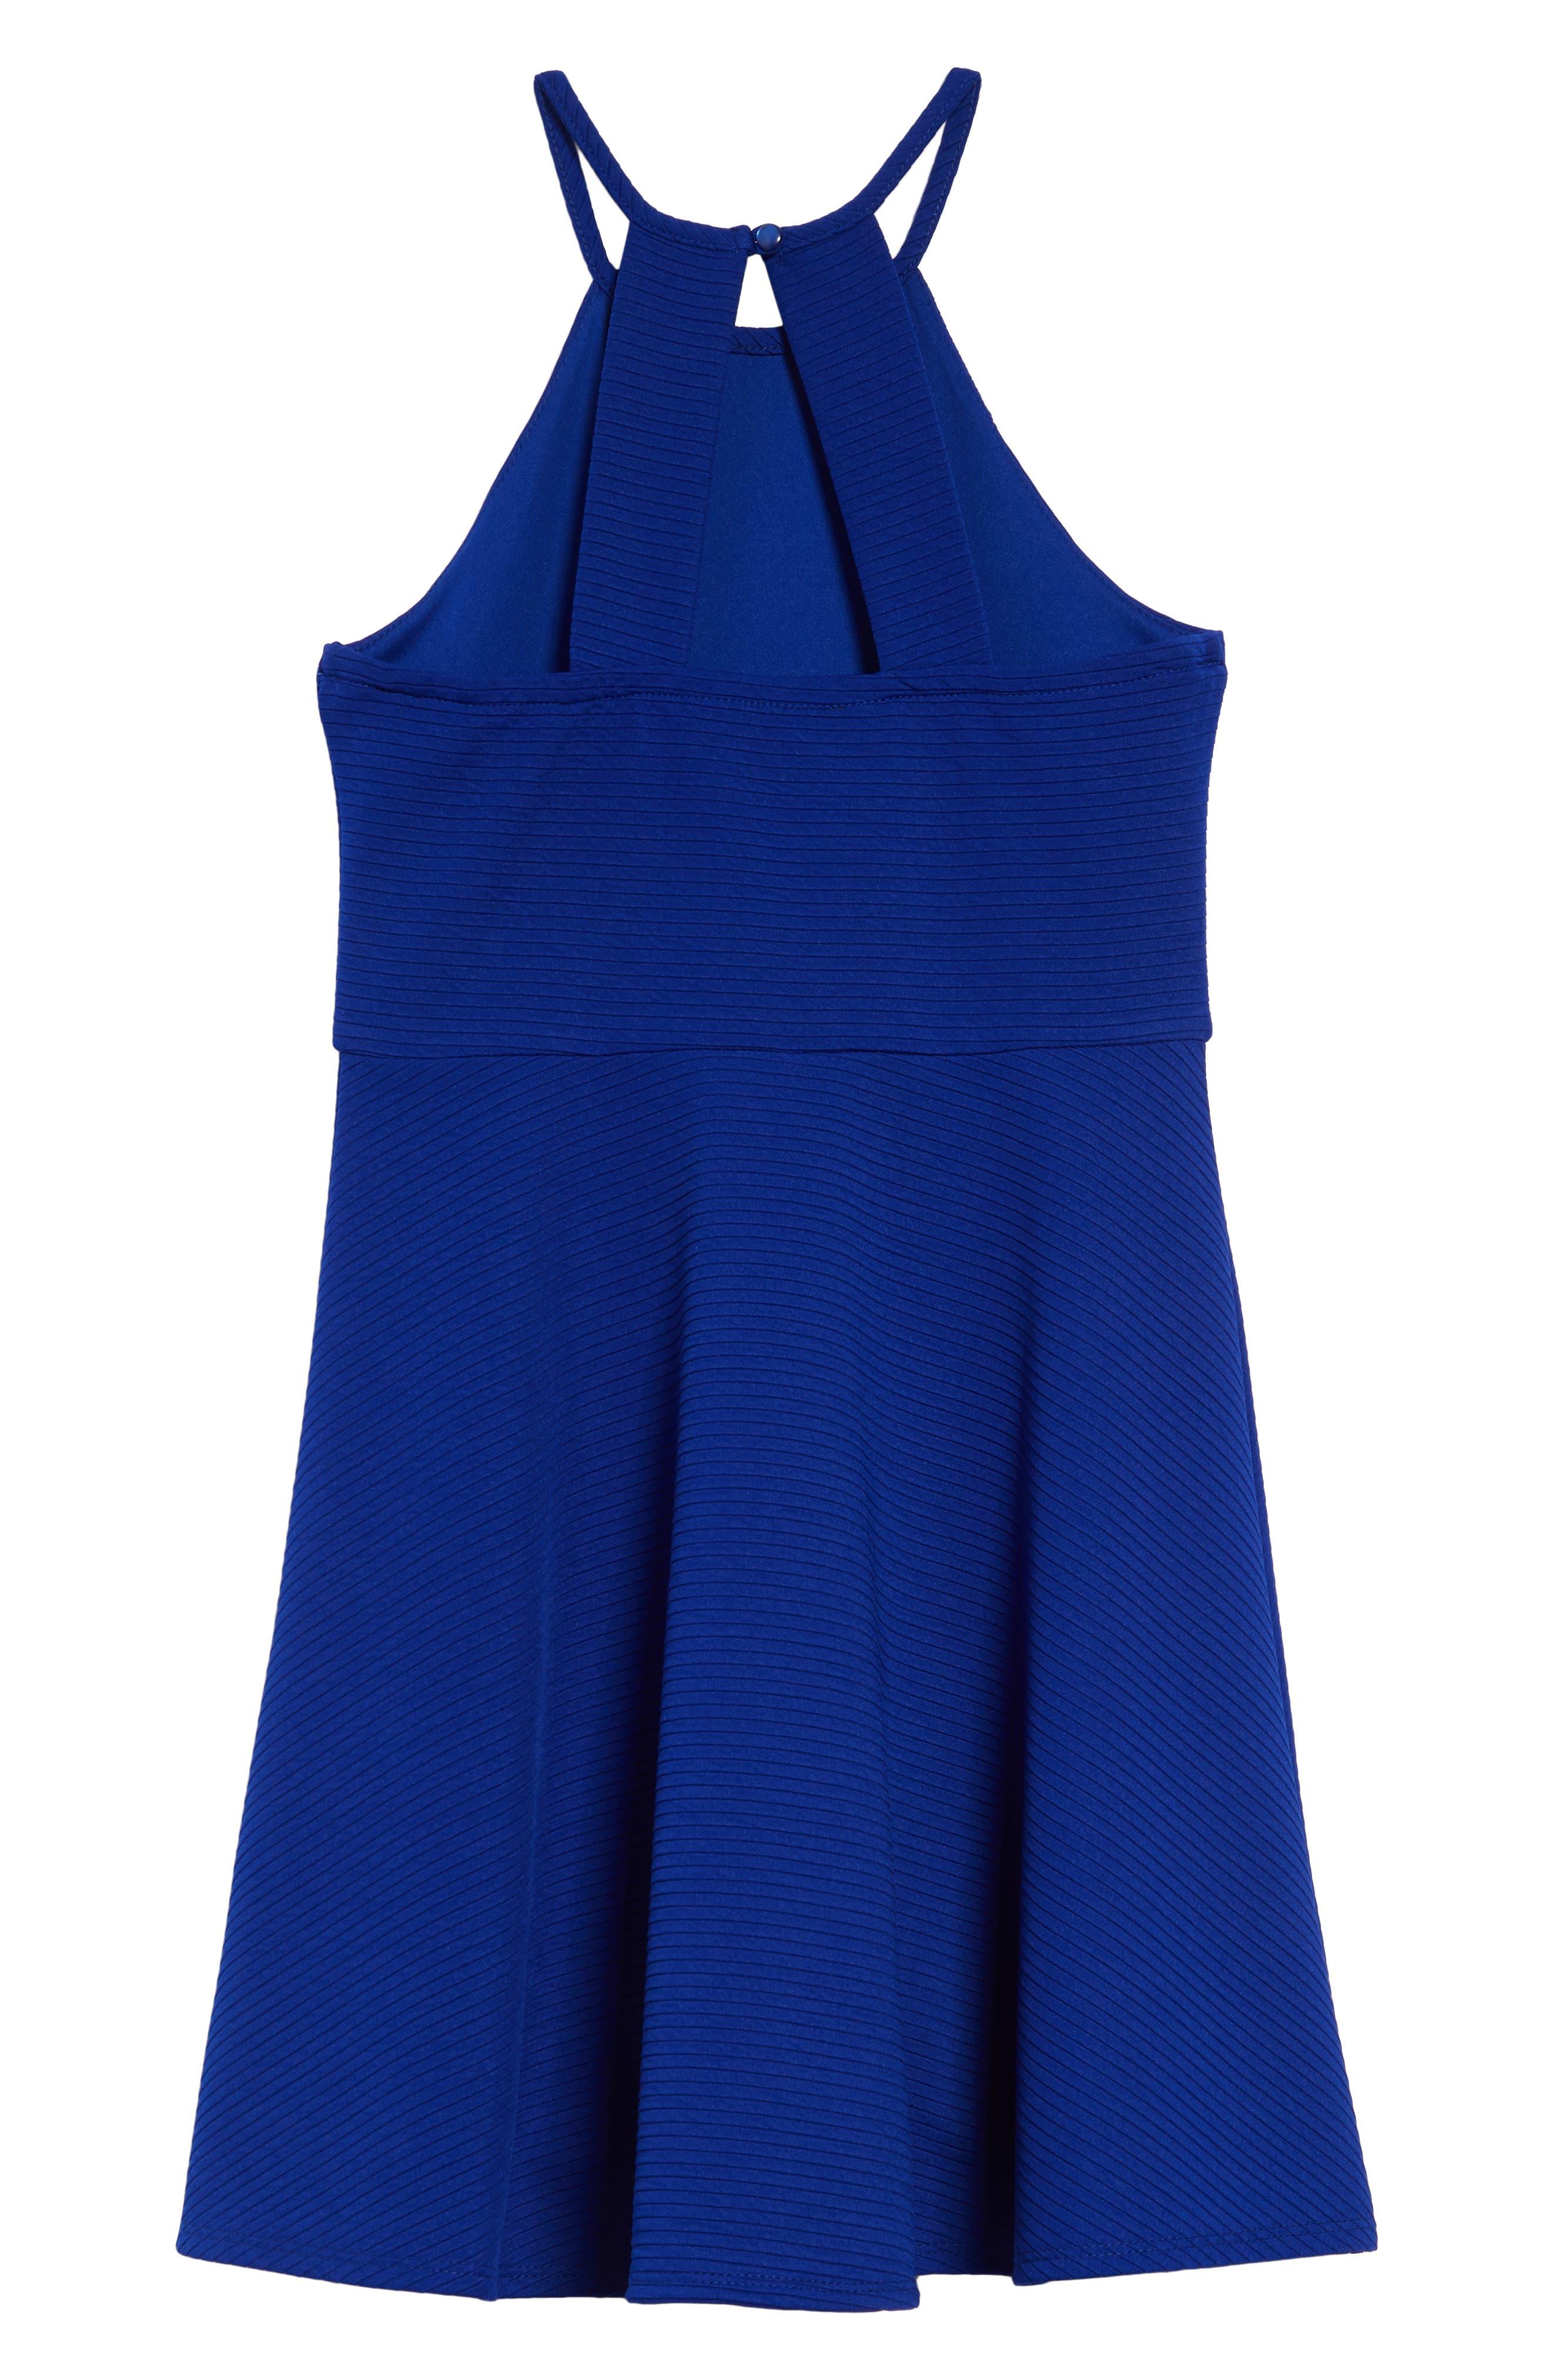 86ed3237fd79be Girls' Dresses & Rompers | Nordstrom